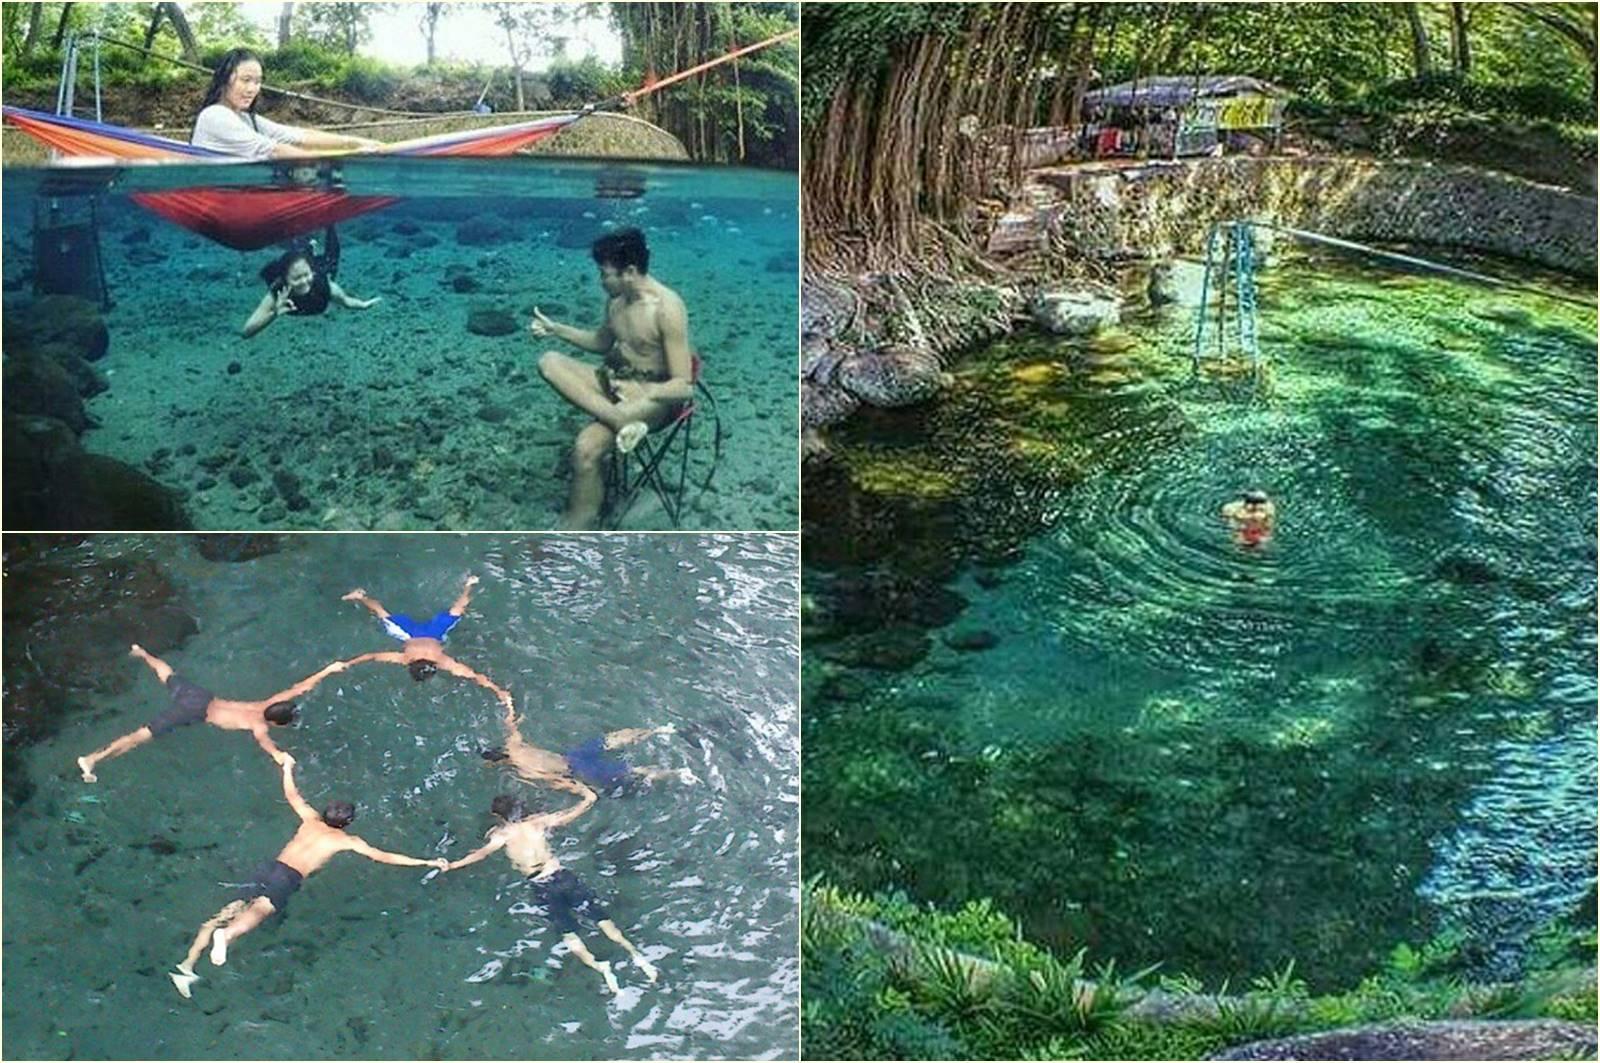 Klaten Desa Umbul Ponggok Aqua Pabrik Potensi Wisata Kabupaten Manten